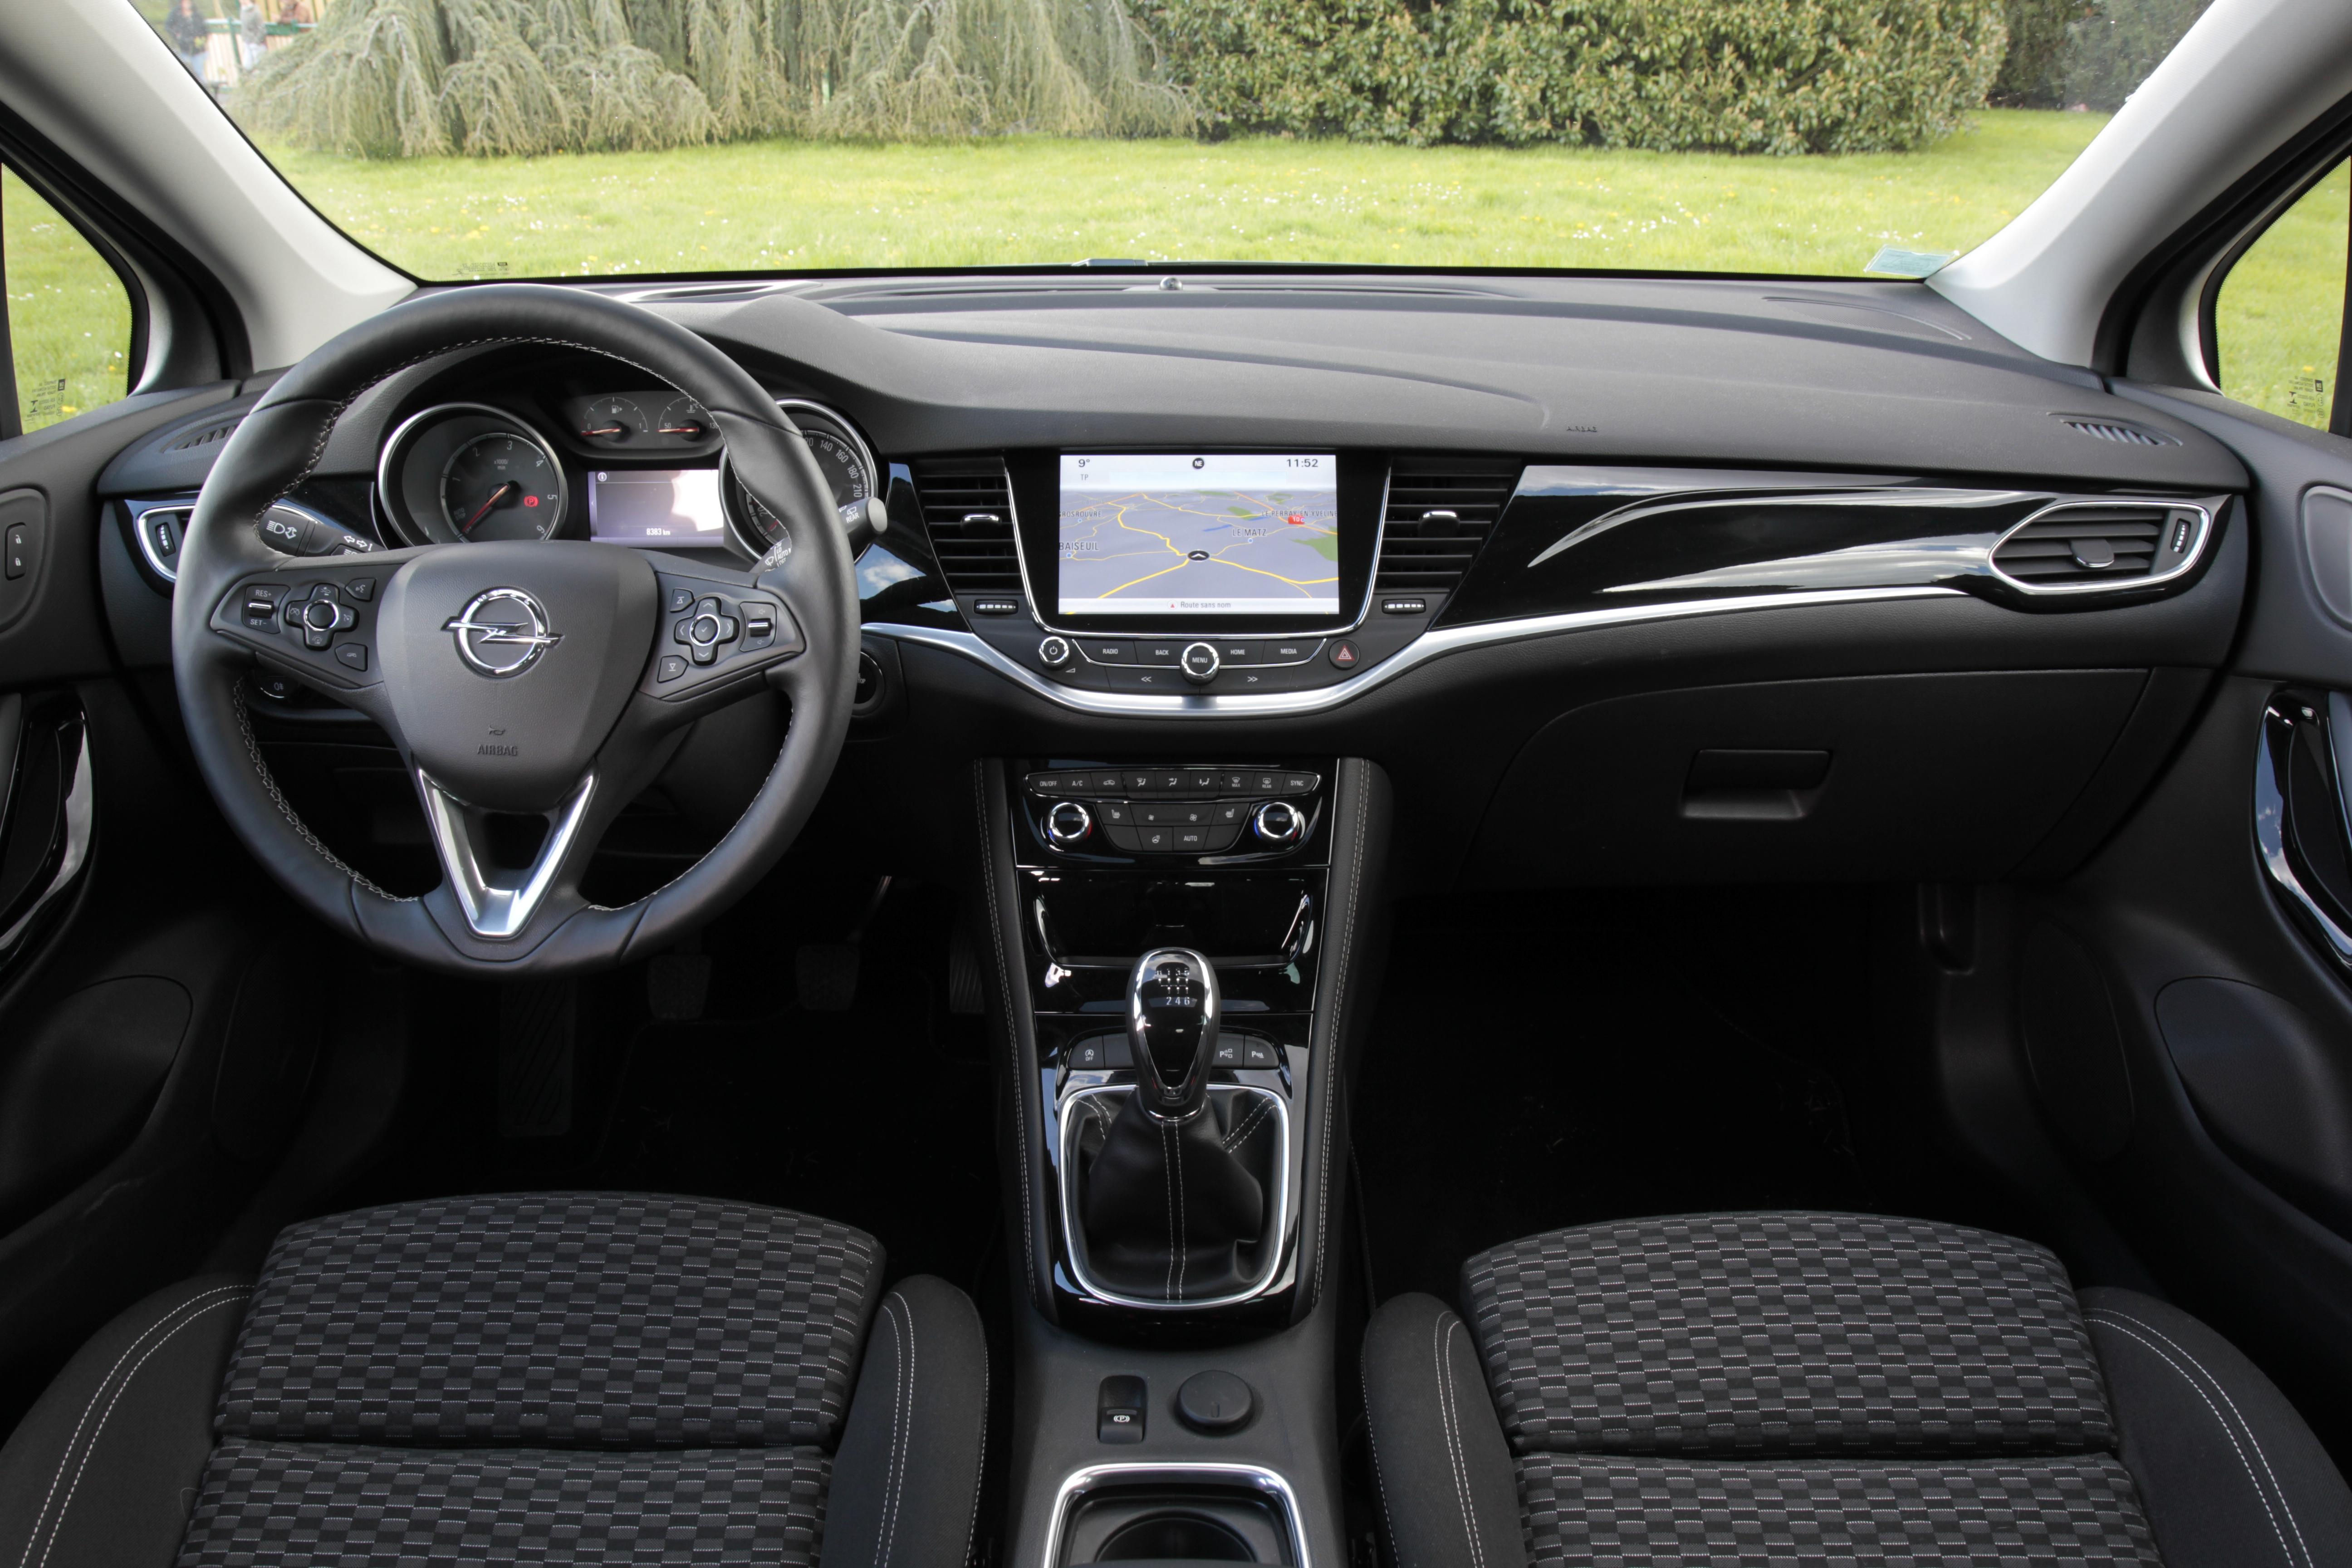 Comparativa: Opel Astra VS Renault Megane VS Volkswagen Golf  S0-comparatif-video-renault-megane-vs-opel-astra-vs-volkswagen-golf-la-deuxieme-tentative-sera-t-elle-la-bonne-378215